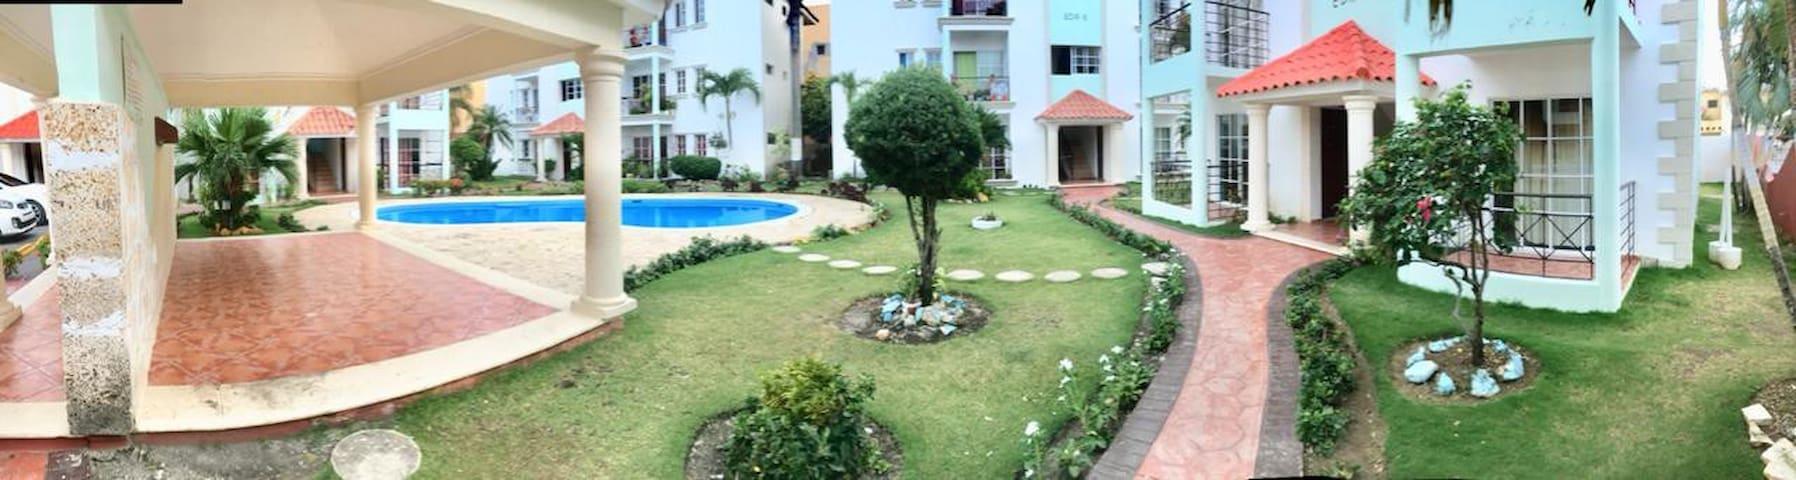 Desiree Apartment, Family Holidays!